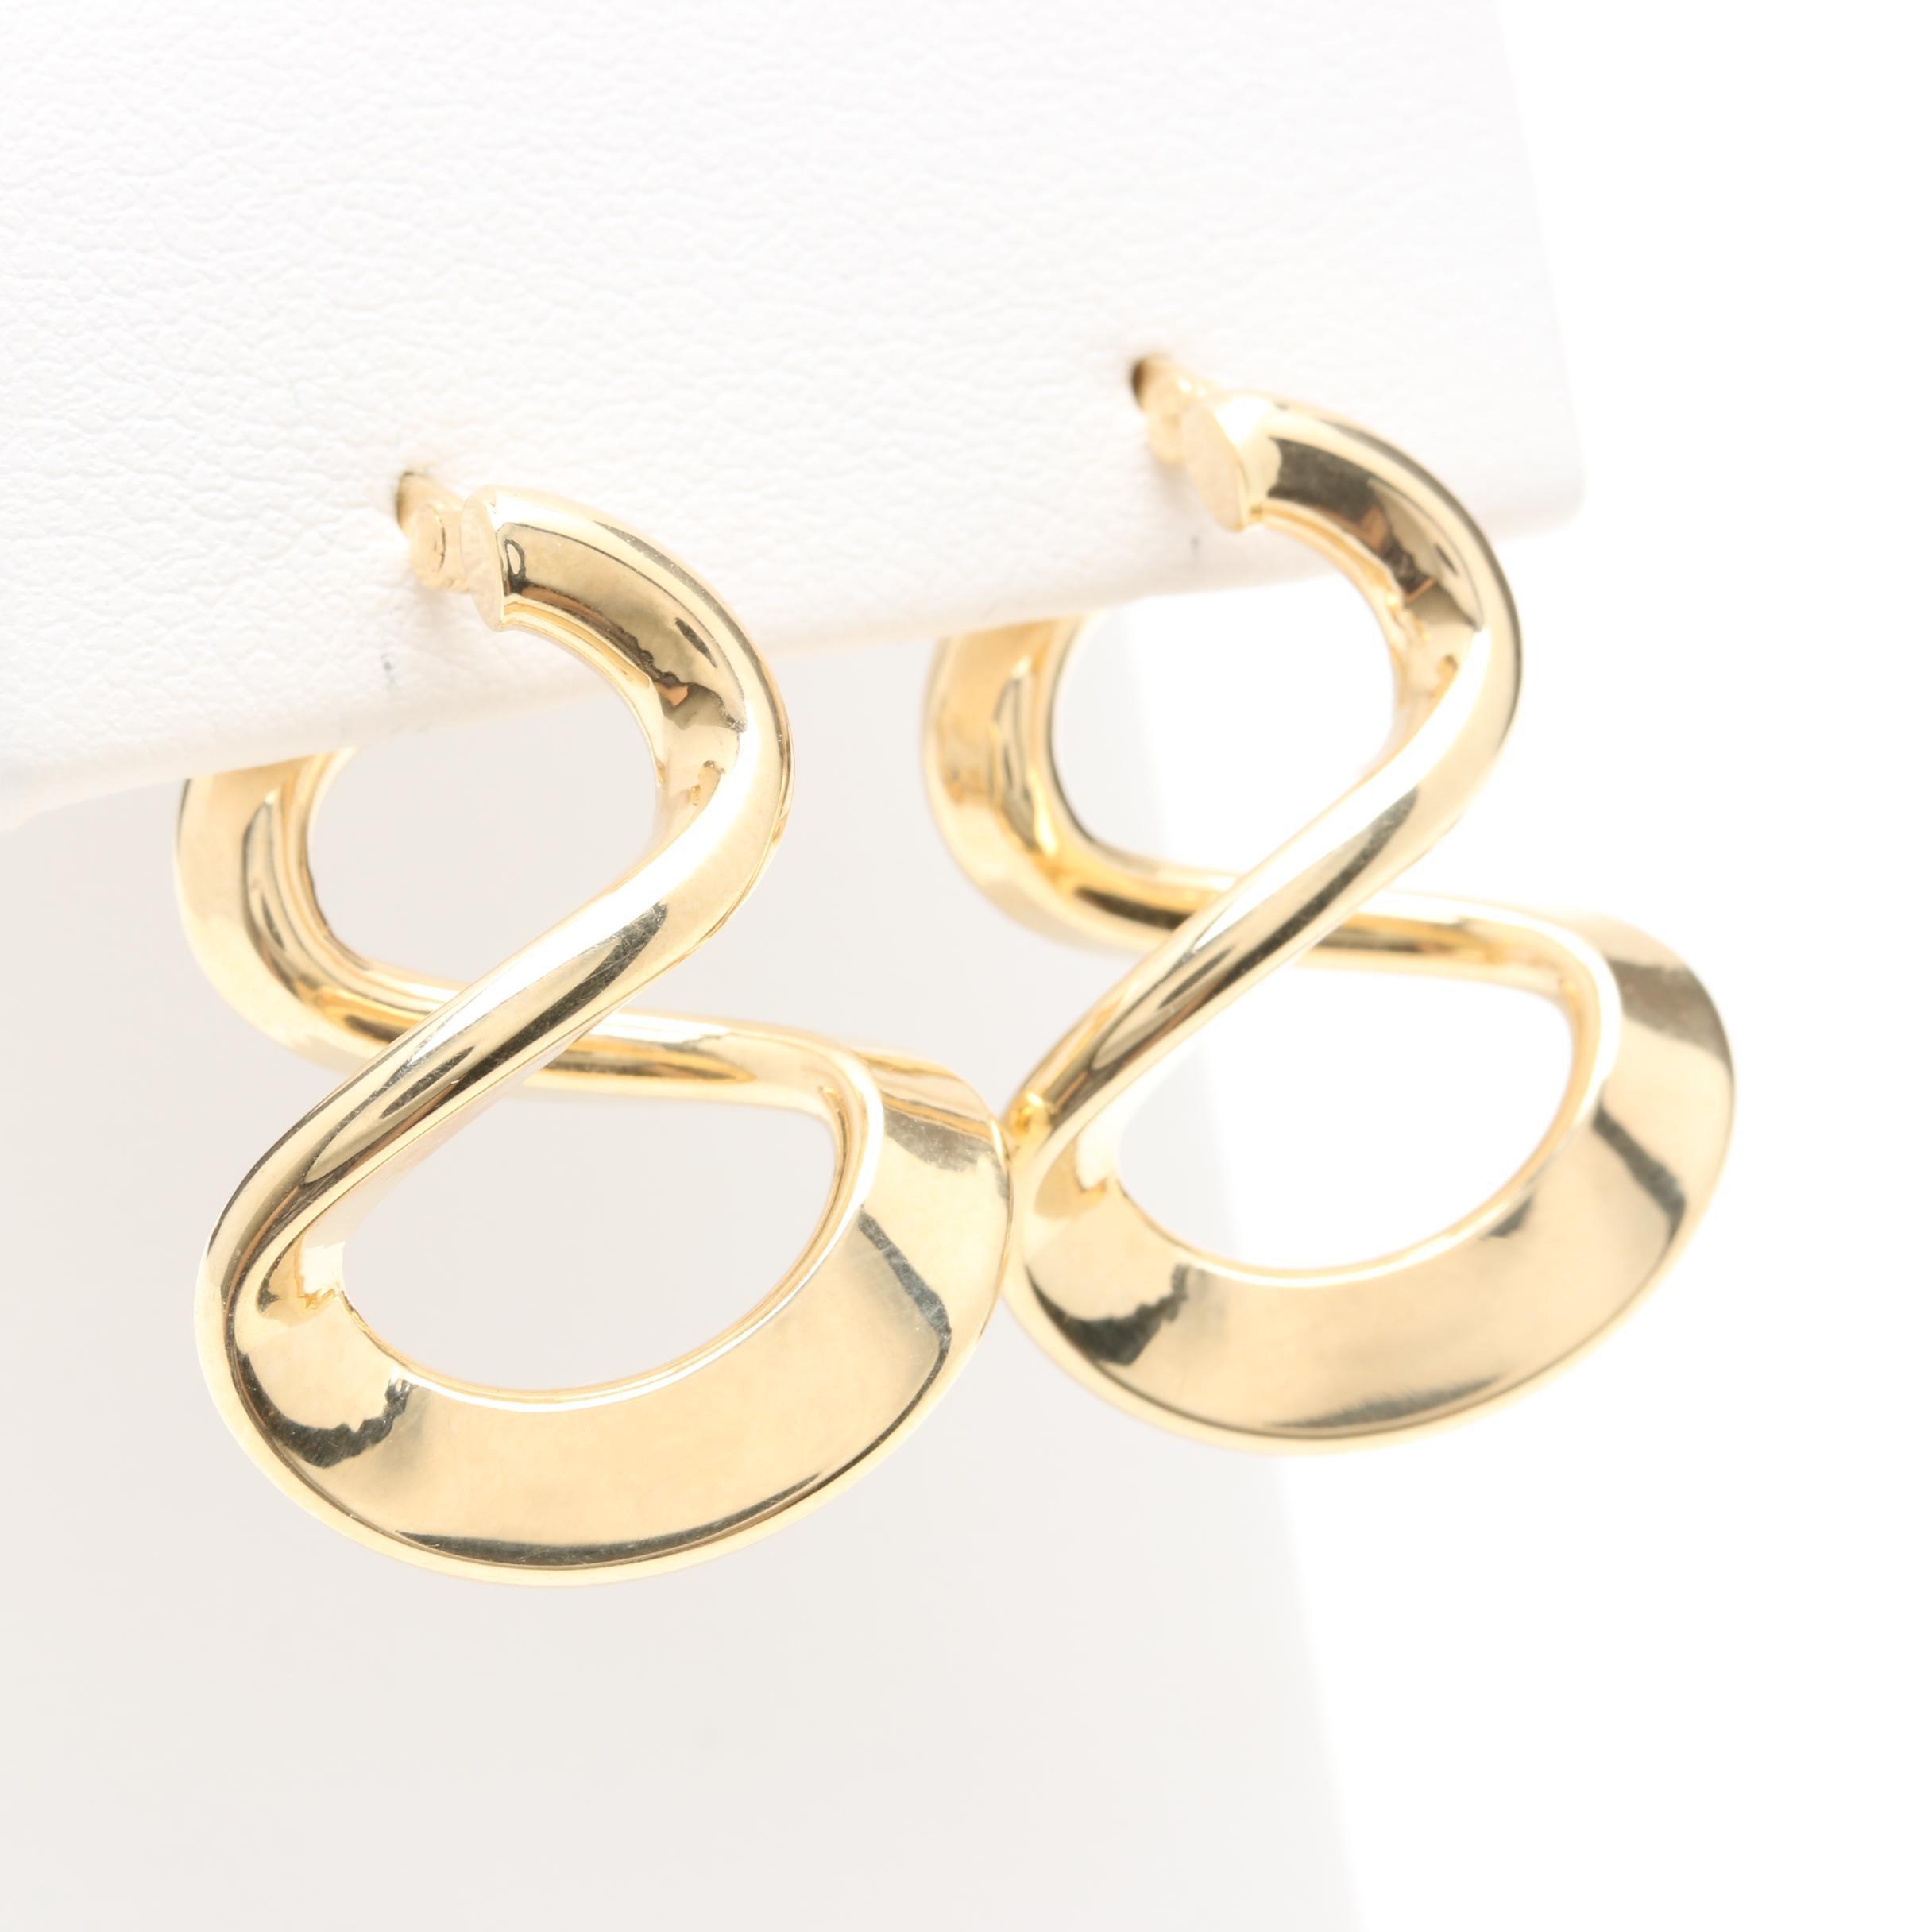 14K Yellow Gold Twisted Earrings